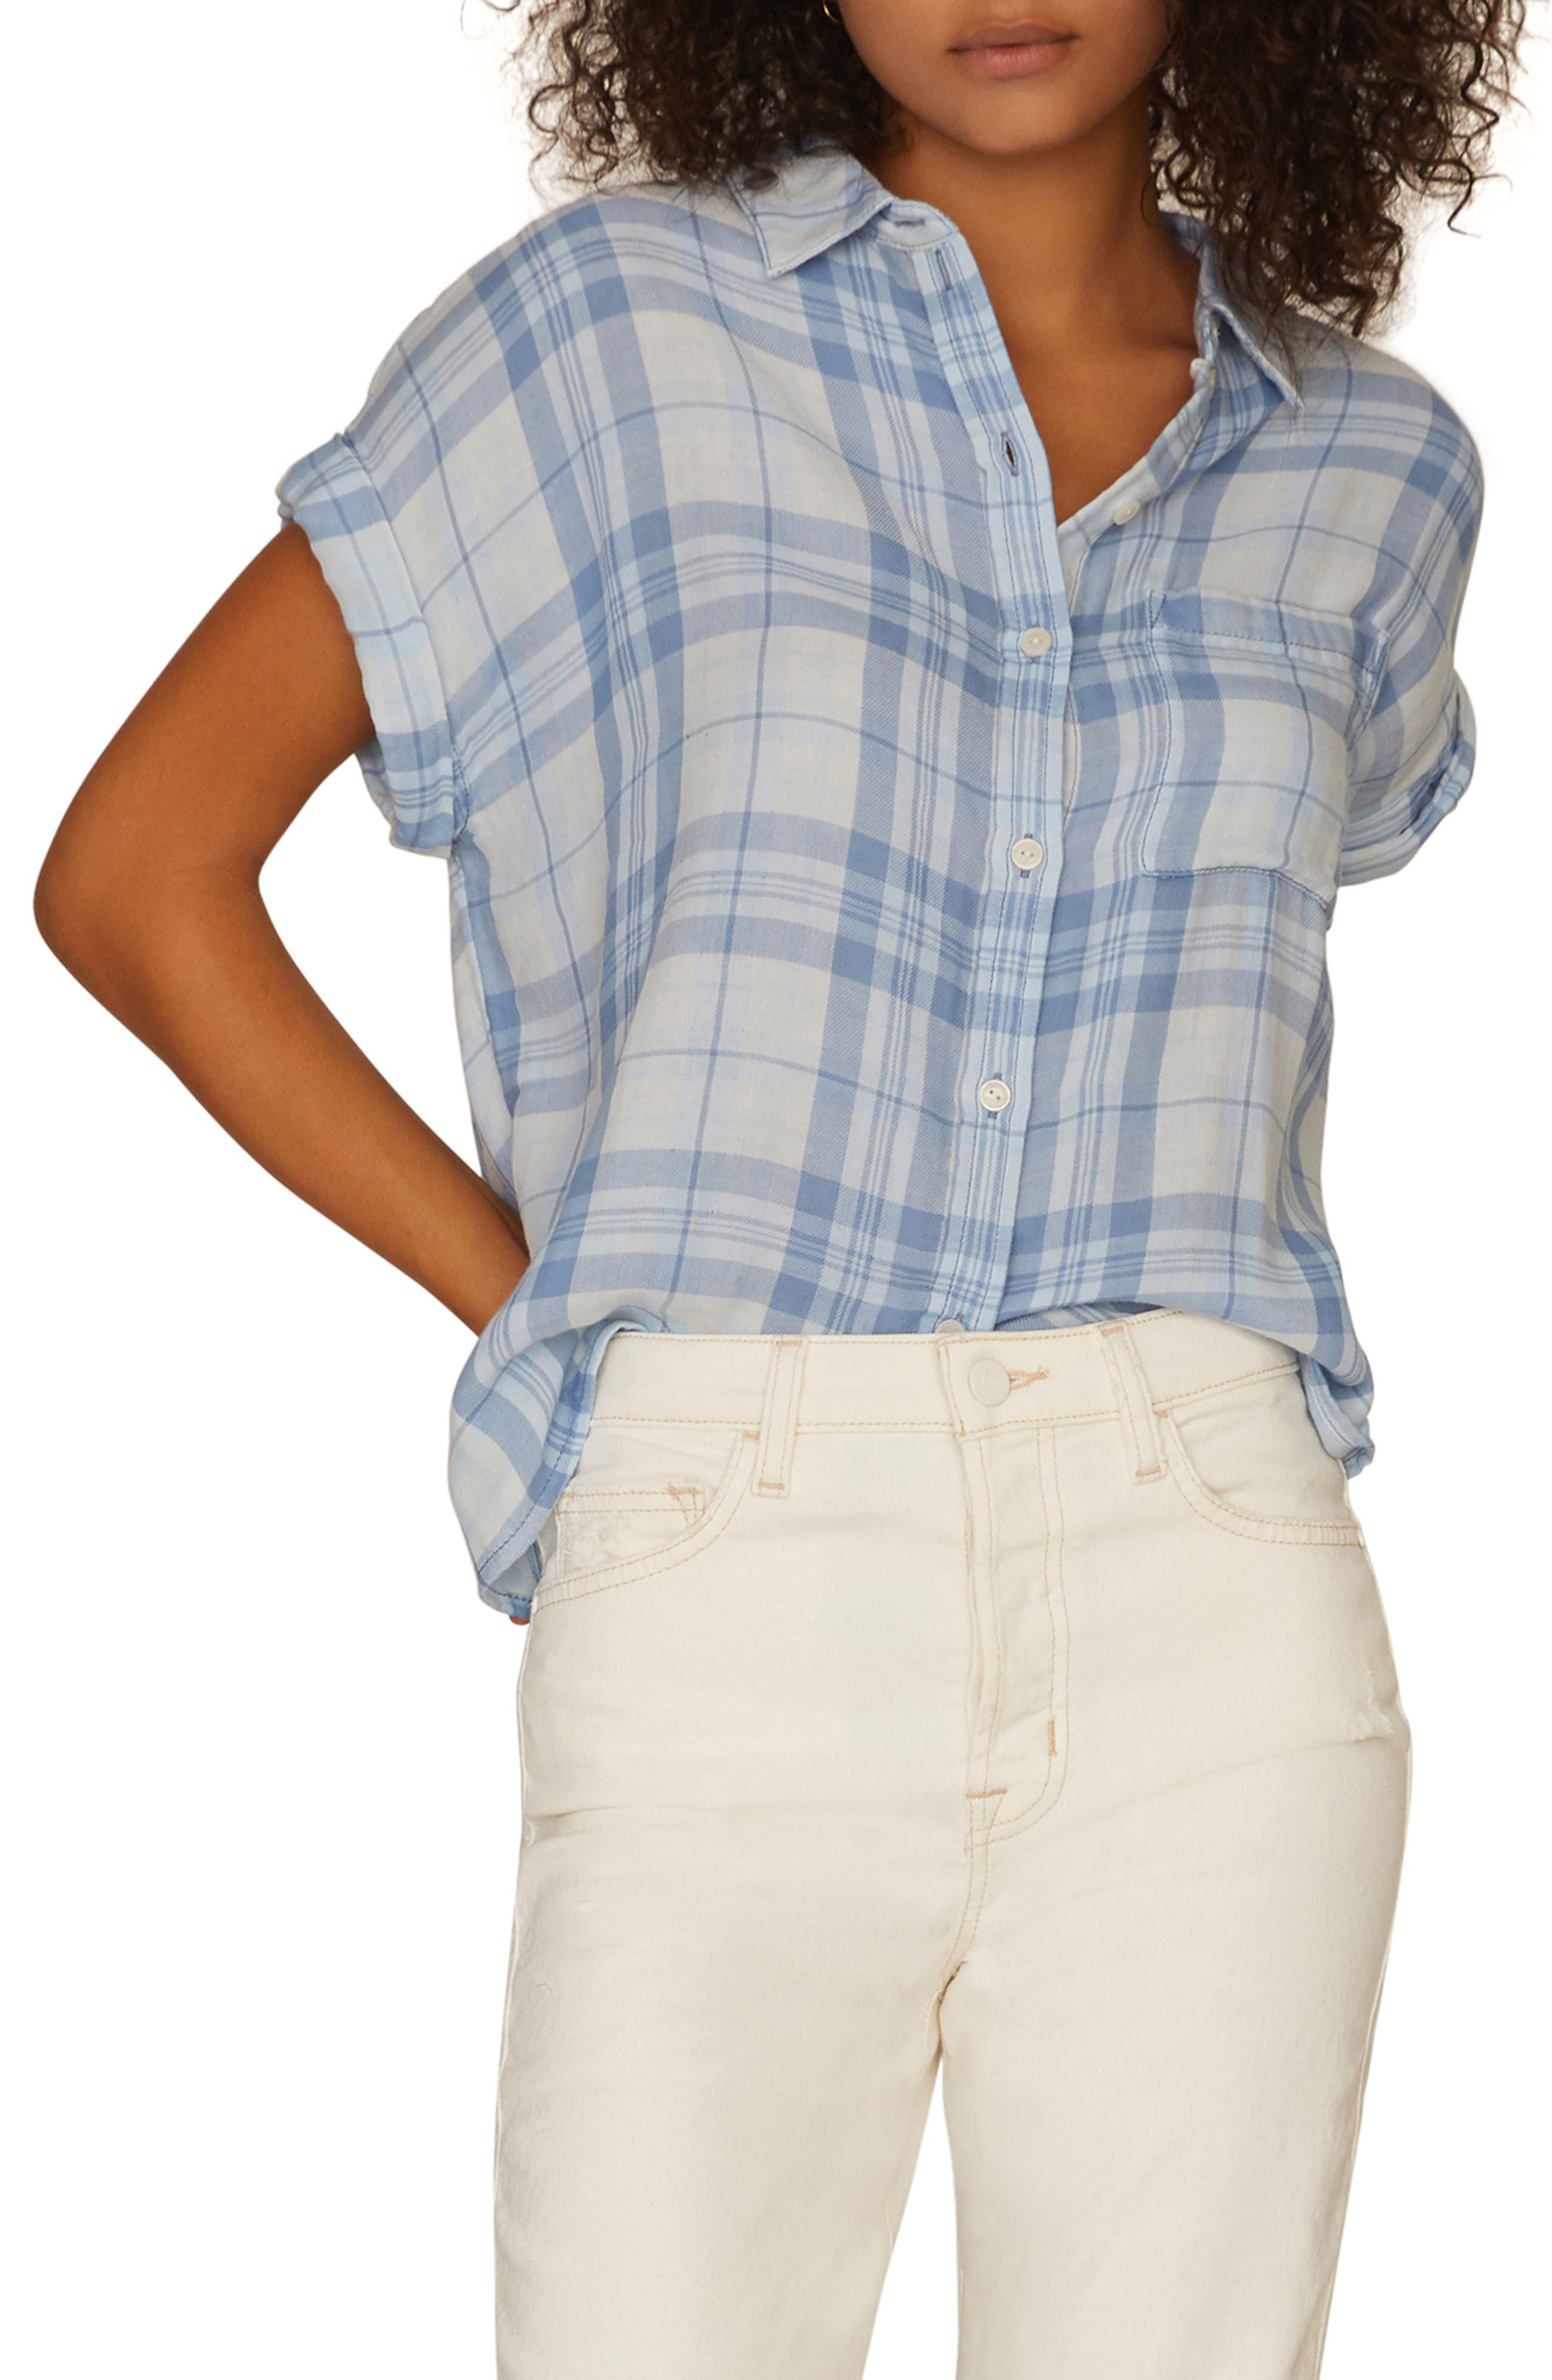 SANCTUARY, Mod Short Sleeve Boyfriend Shirt, Main thumbnail 1, color, BLEACH OUT WHITE